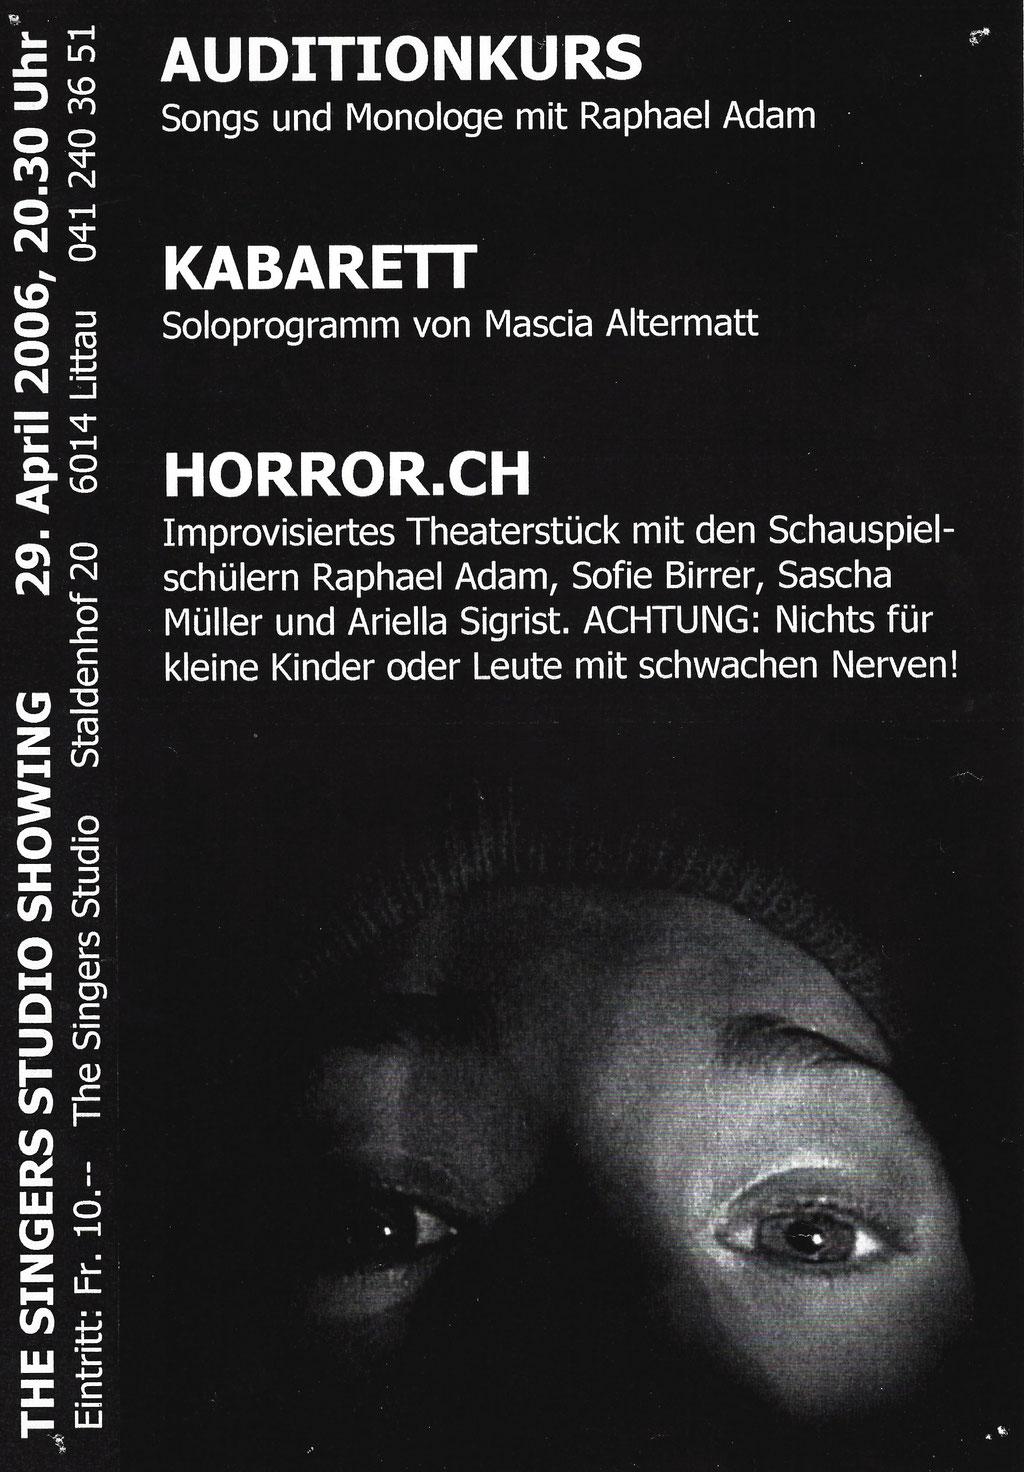 2006 THEATERSTÜCK - HORROR.CH